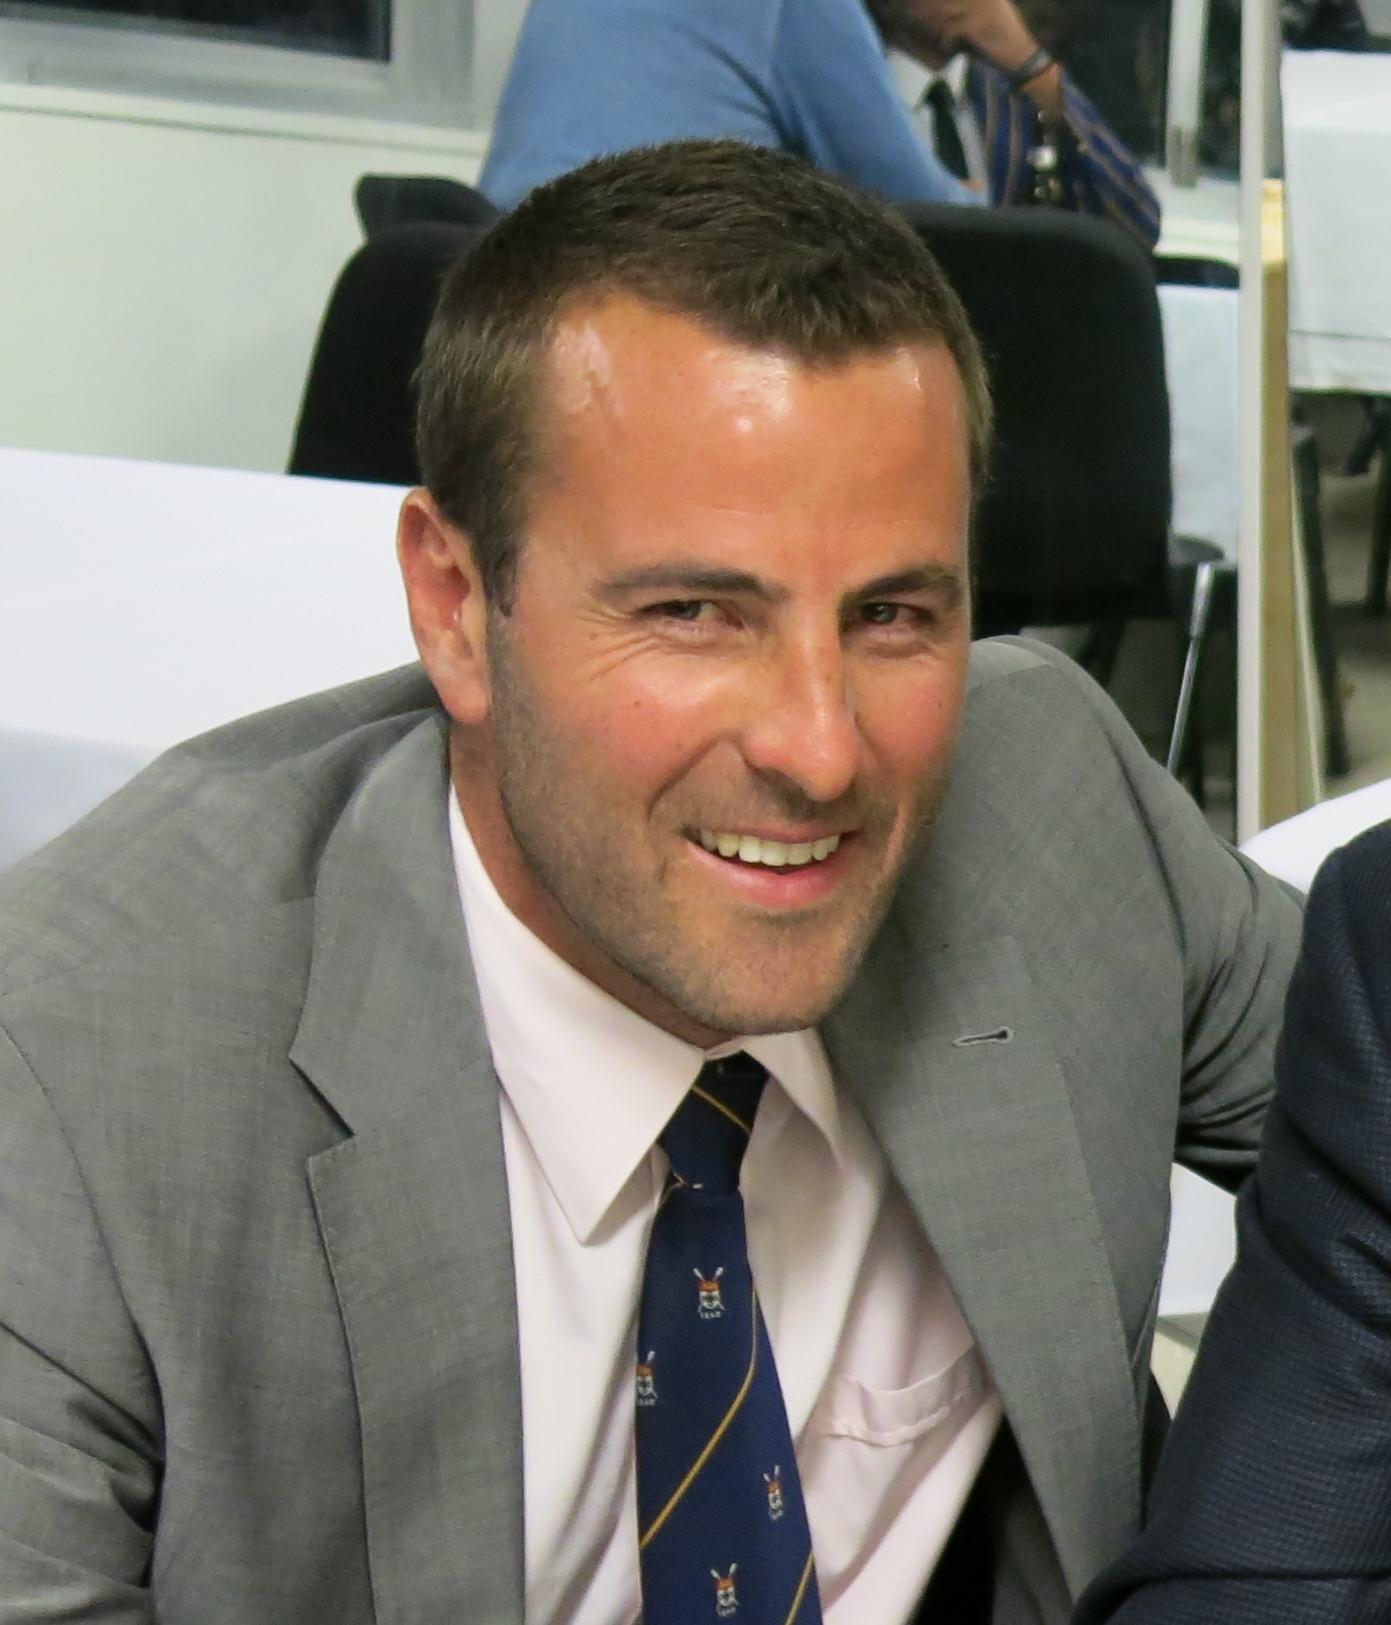 Mark Prater